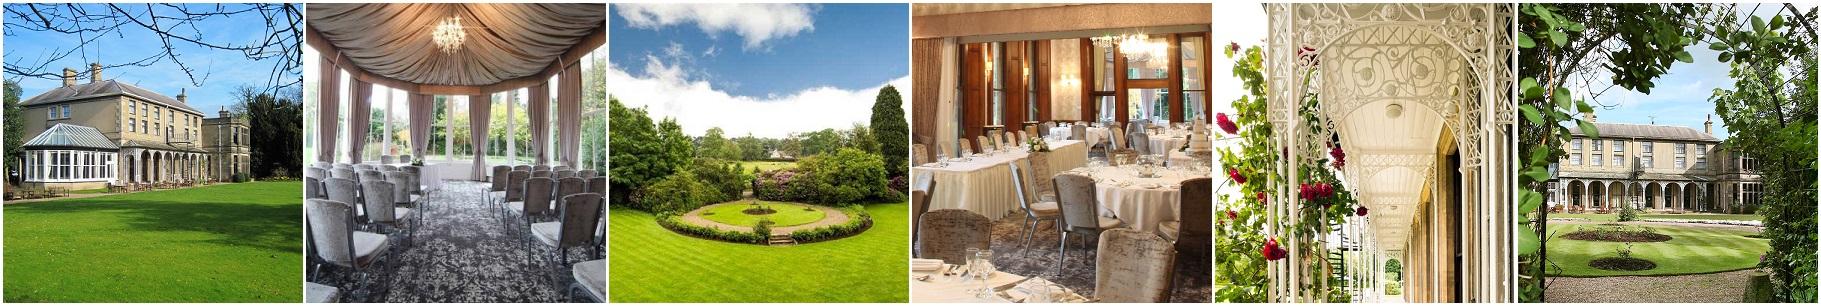 Mercure Newton Park Photos- Staffordshire Wedding Venues